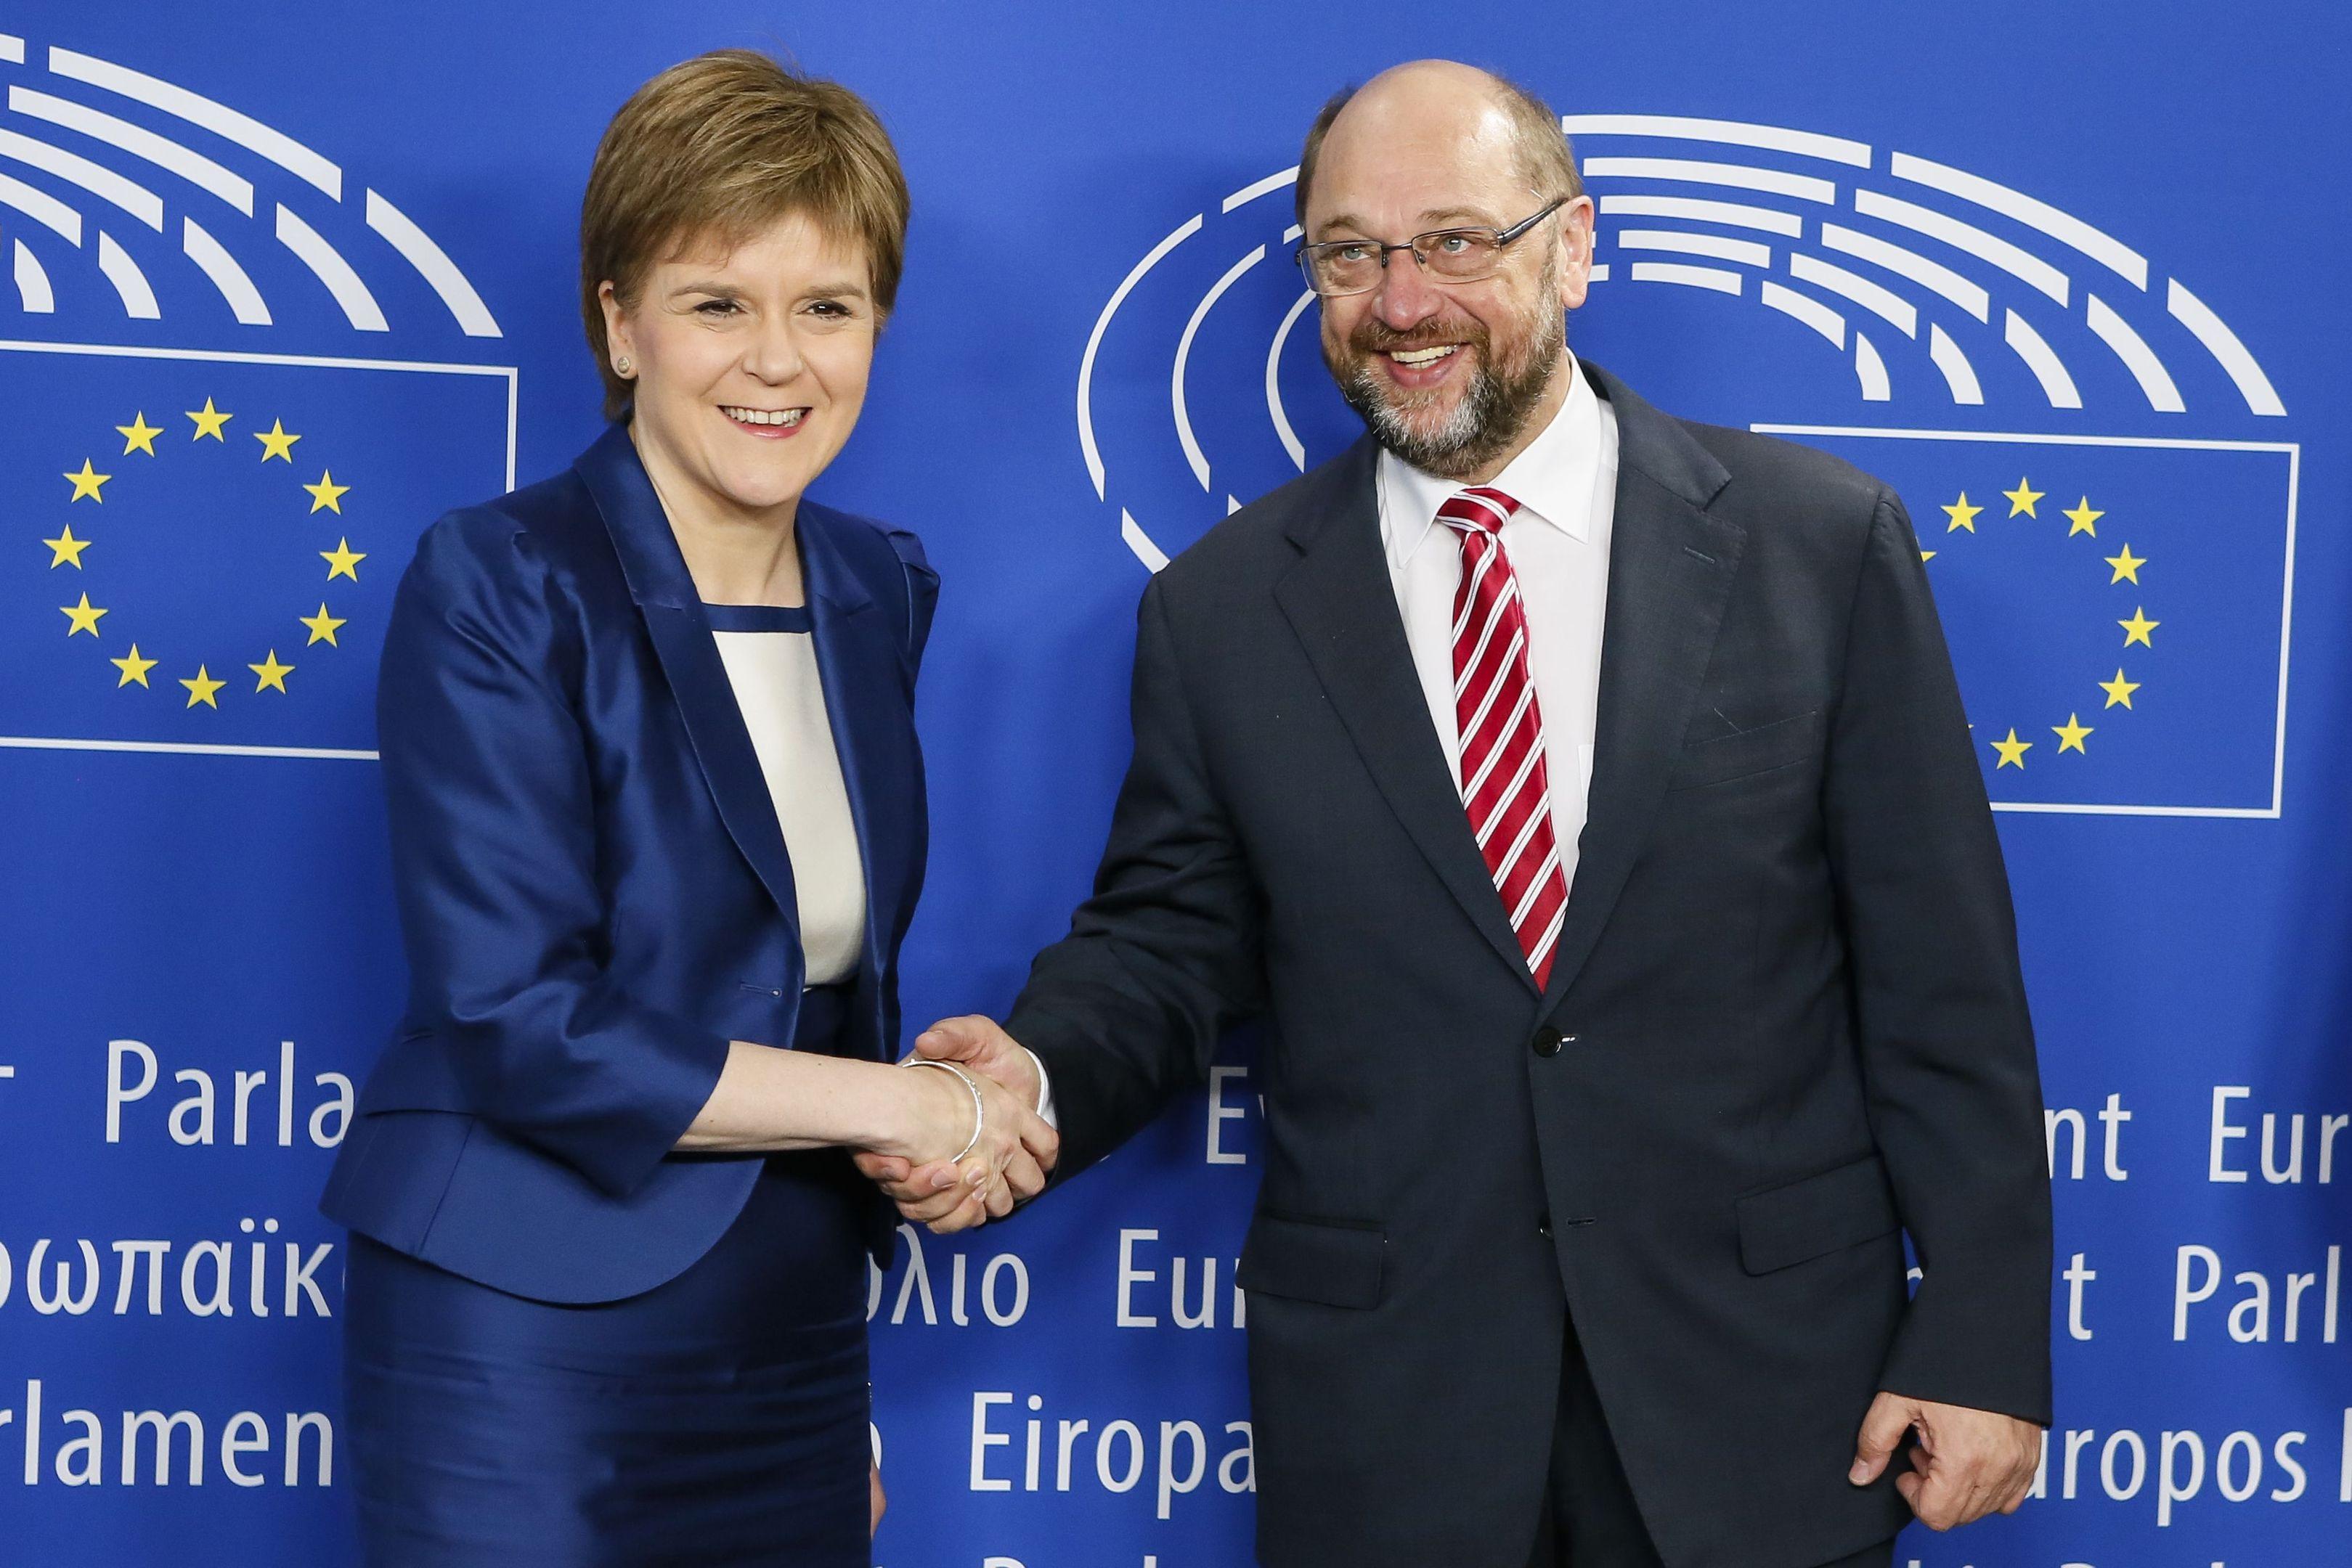 First Minister Nicola Sturgeon with European Parliament President Martin Schulz.